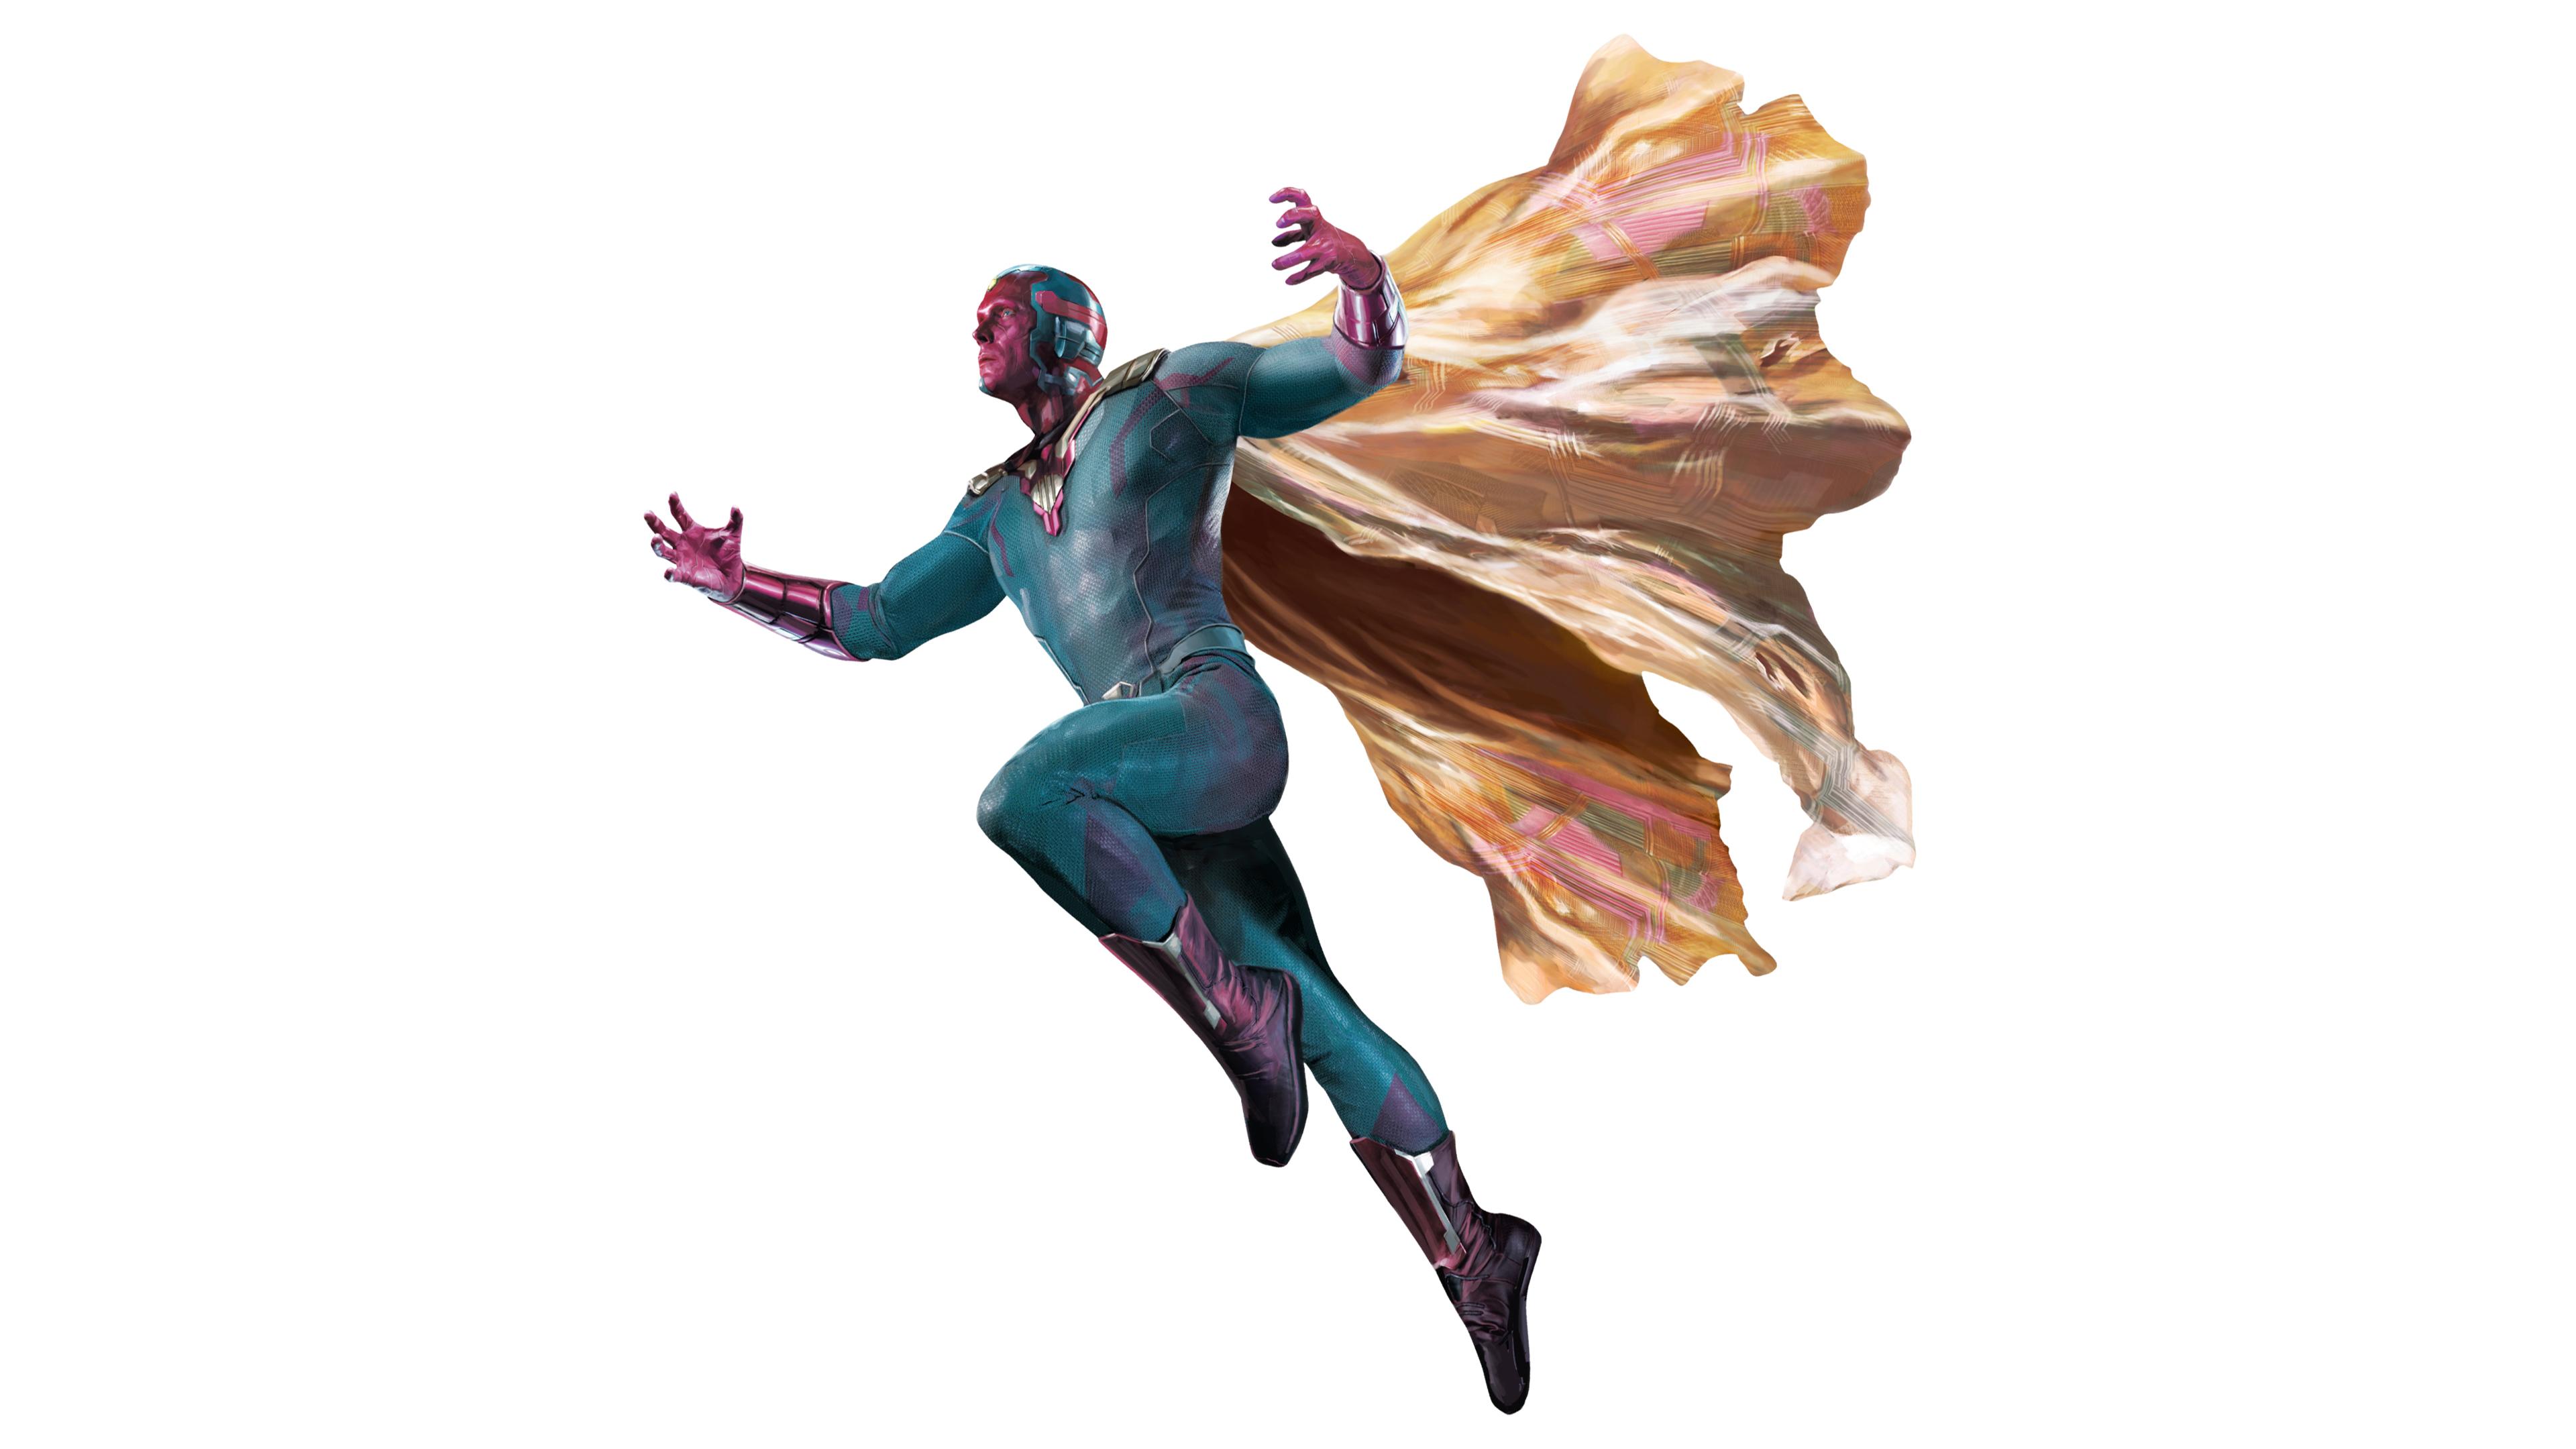 2048x2048 Venom 2018 Movie 4k Ipad Air Hd 4k Wallpapers: 2048x2048 Vision In Avengers Infinity War 2018 Ipad Air HD